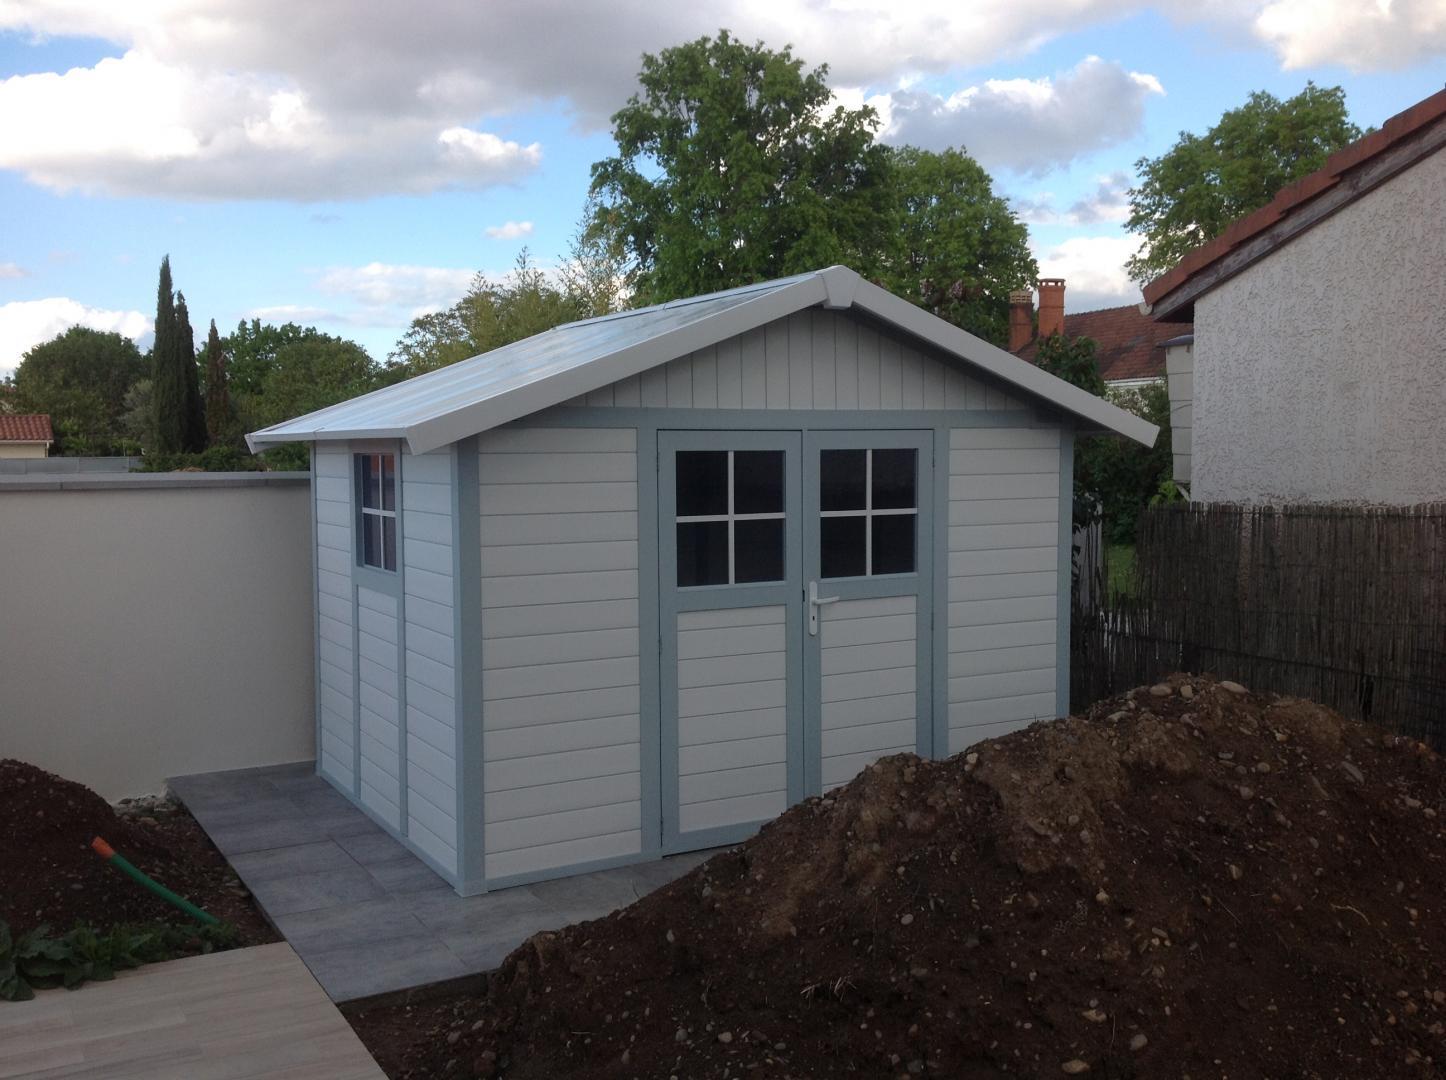 grosfillex abri de jardin pvc 11 m sherwood deco garden sheds grosfillex grosfillex deco 10x8. Black Bedroom Furniture Sets. Home Design Ideas